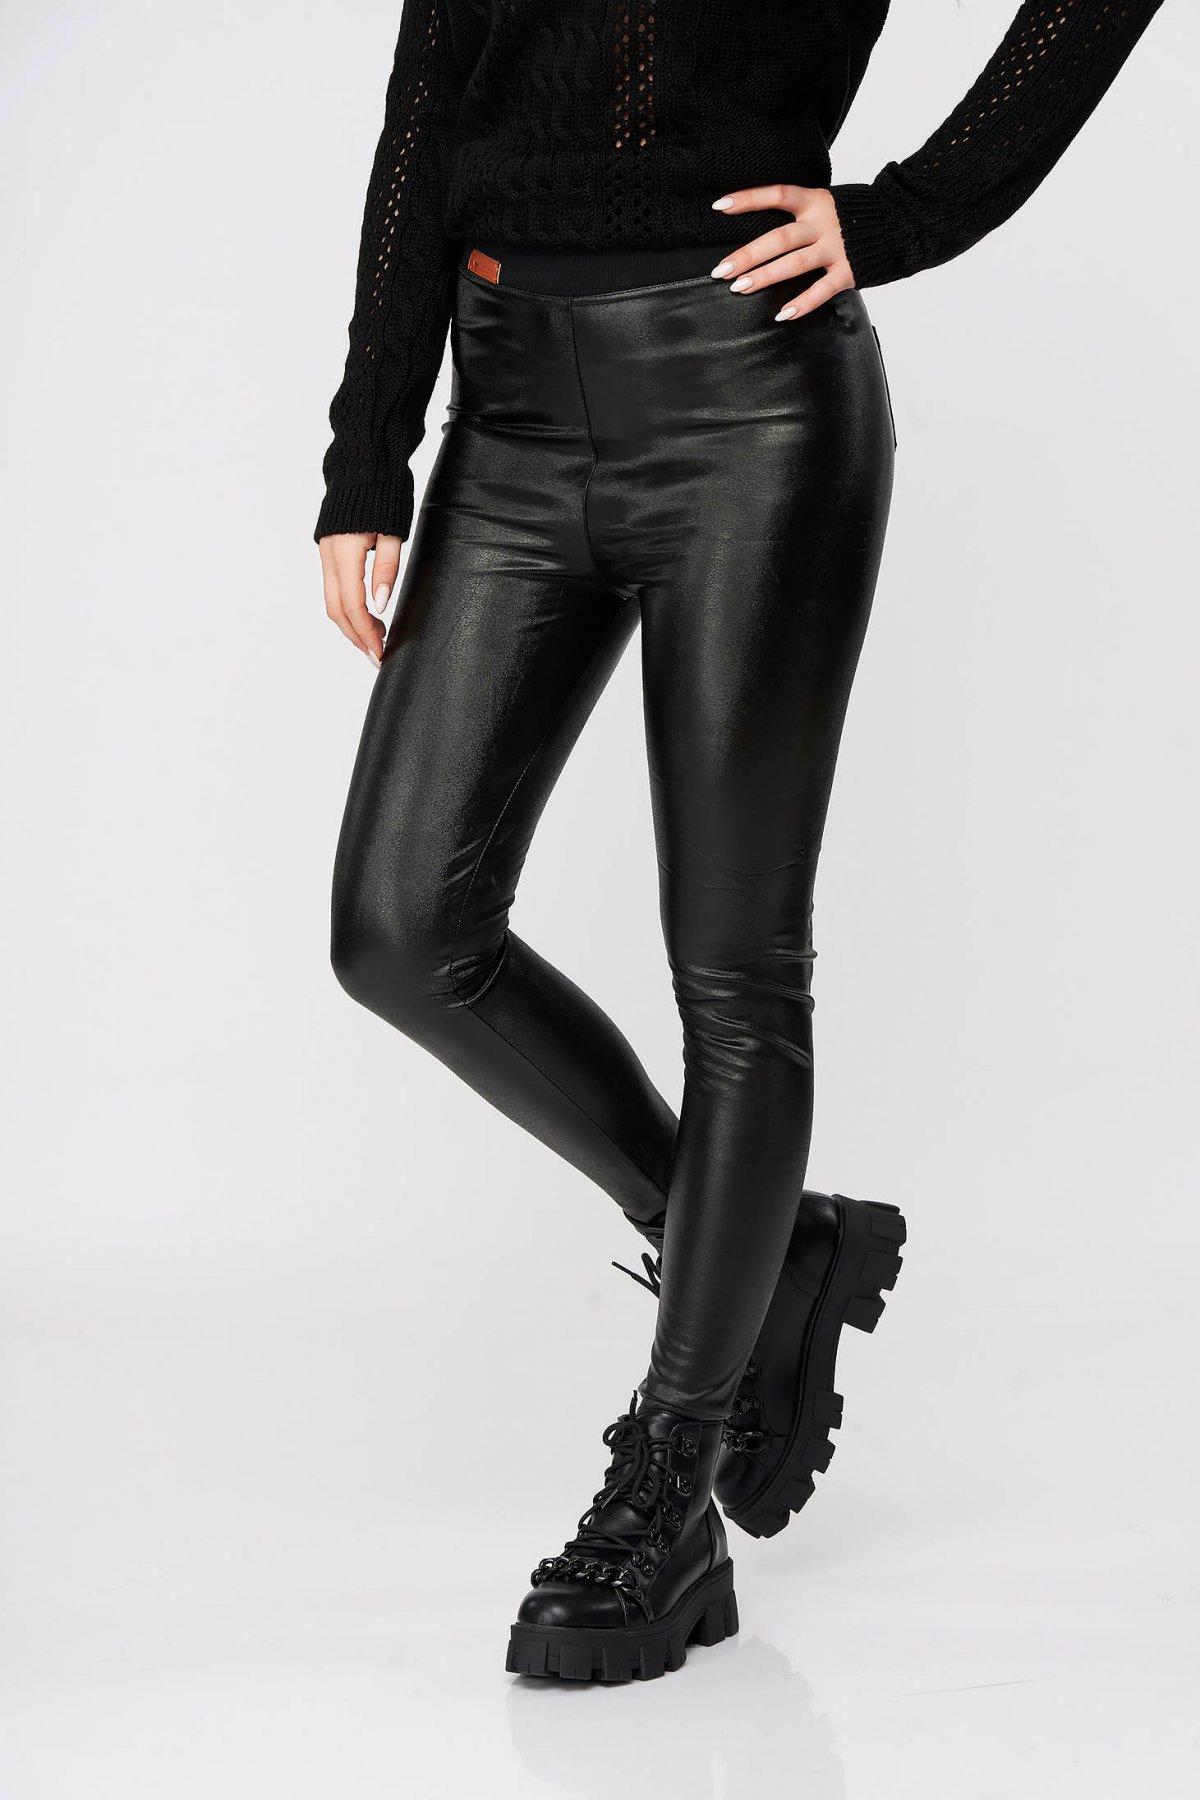 Pantaloni Sunshine Negri Casual Din Material Lucios Cu Elastic In Talie